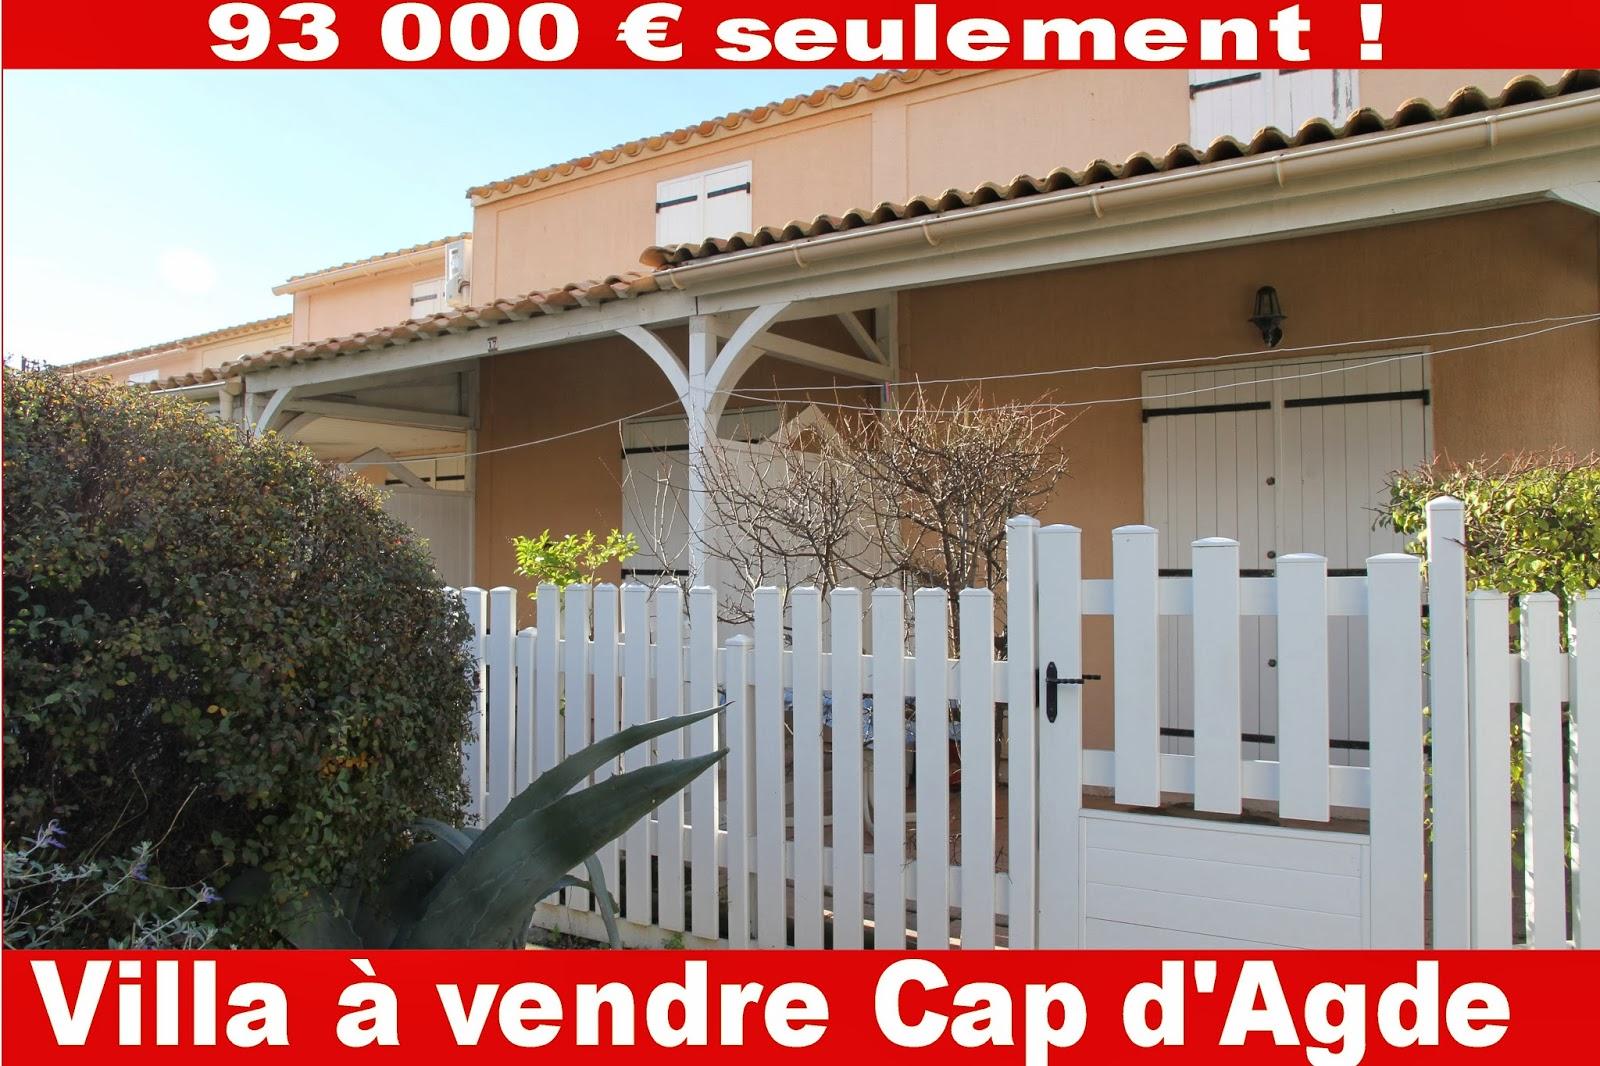 agence cap d 39 agde conseils en immobilier 34300 france languedoc a vendre cap d 39 agde villa plage. Black Bedroom Furniture Sets. Home Design Ideas